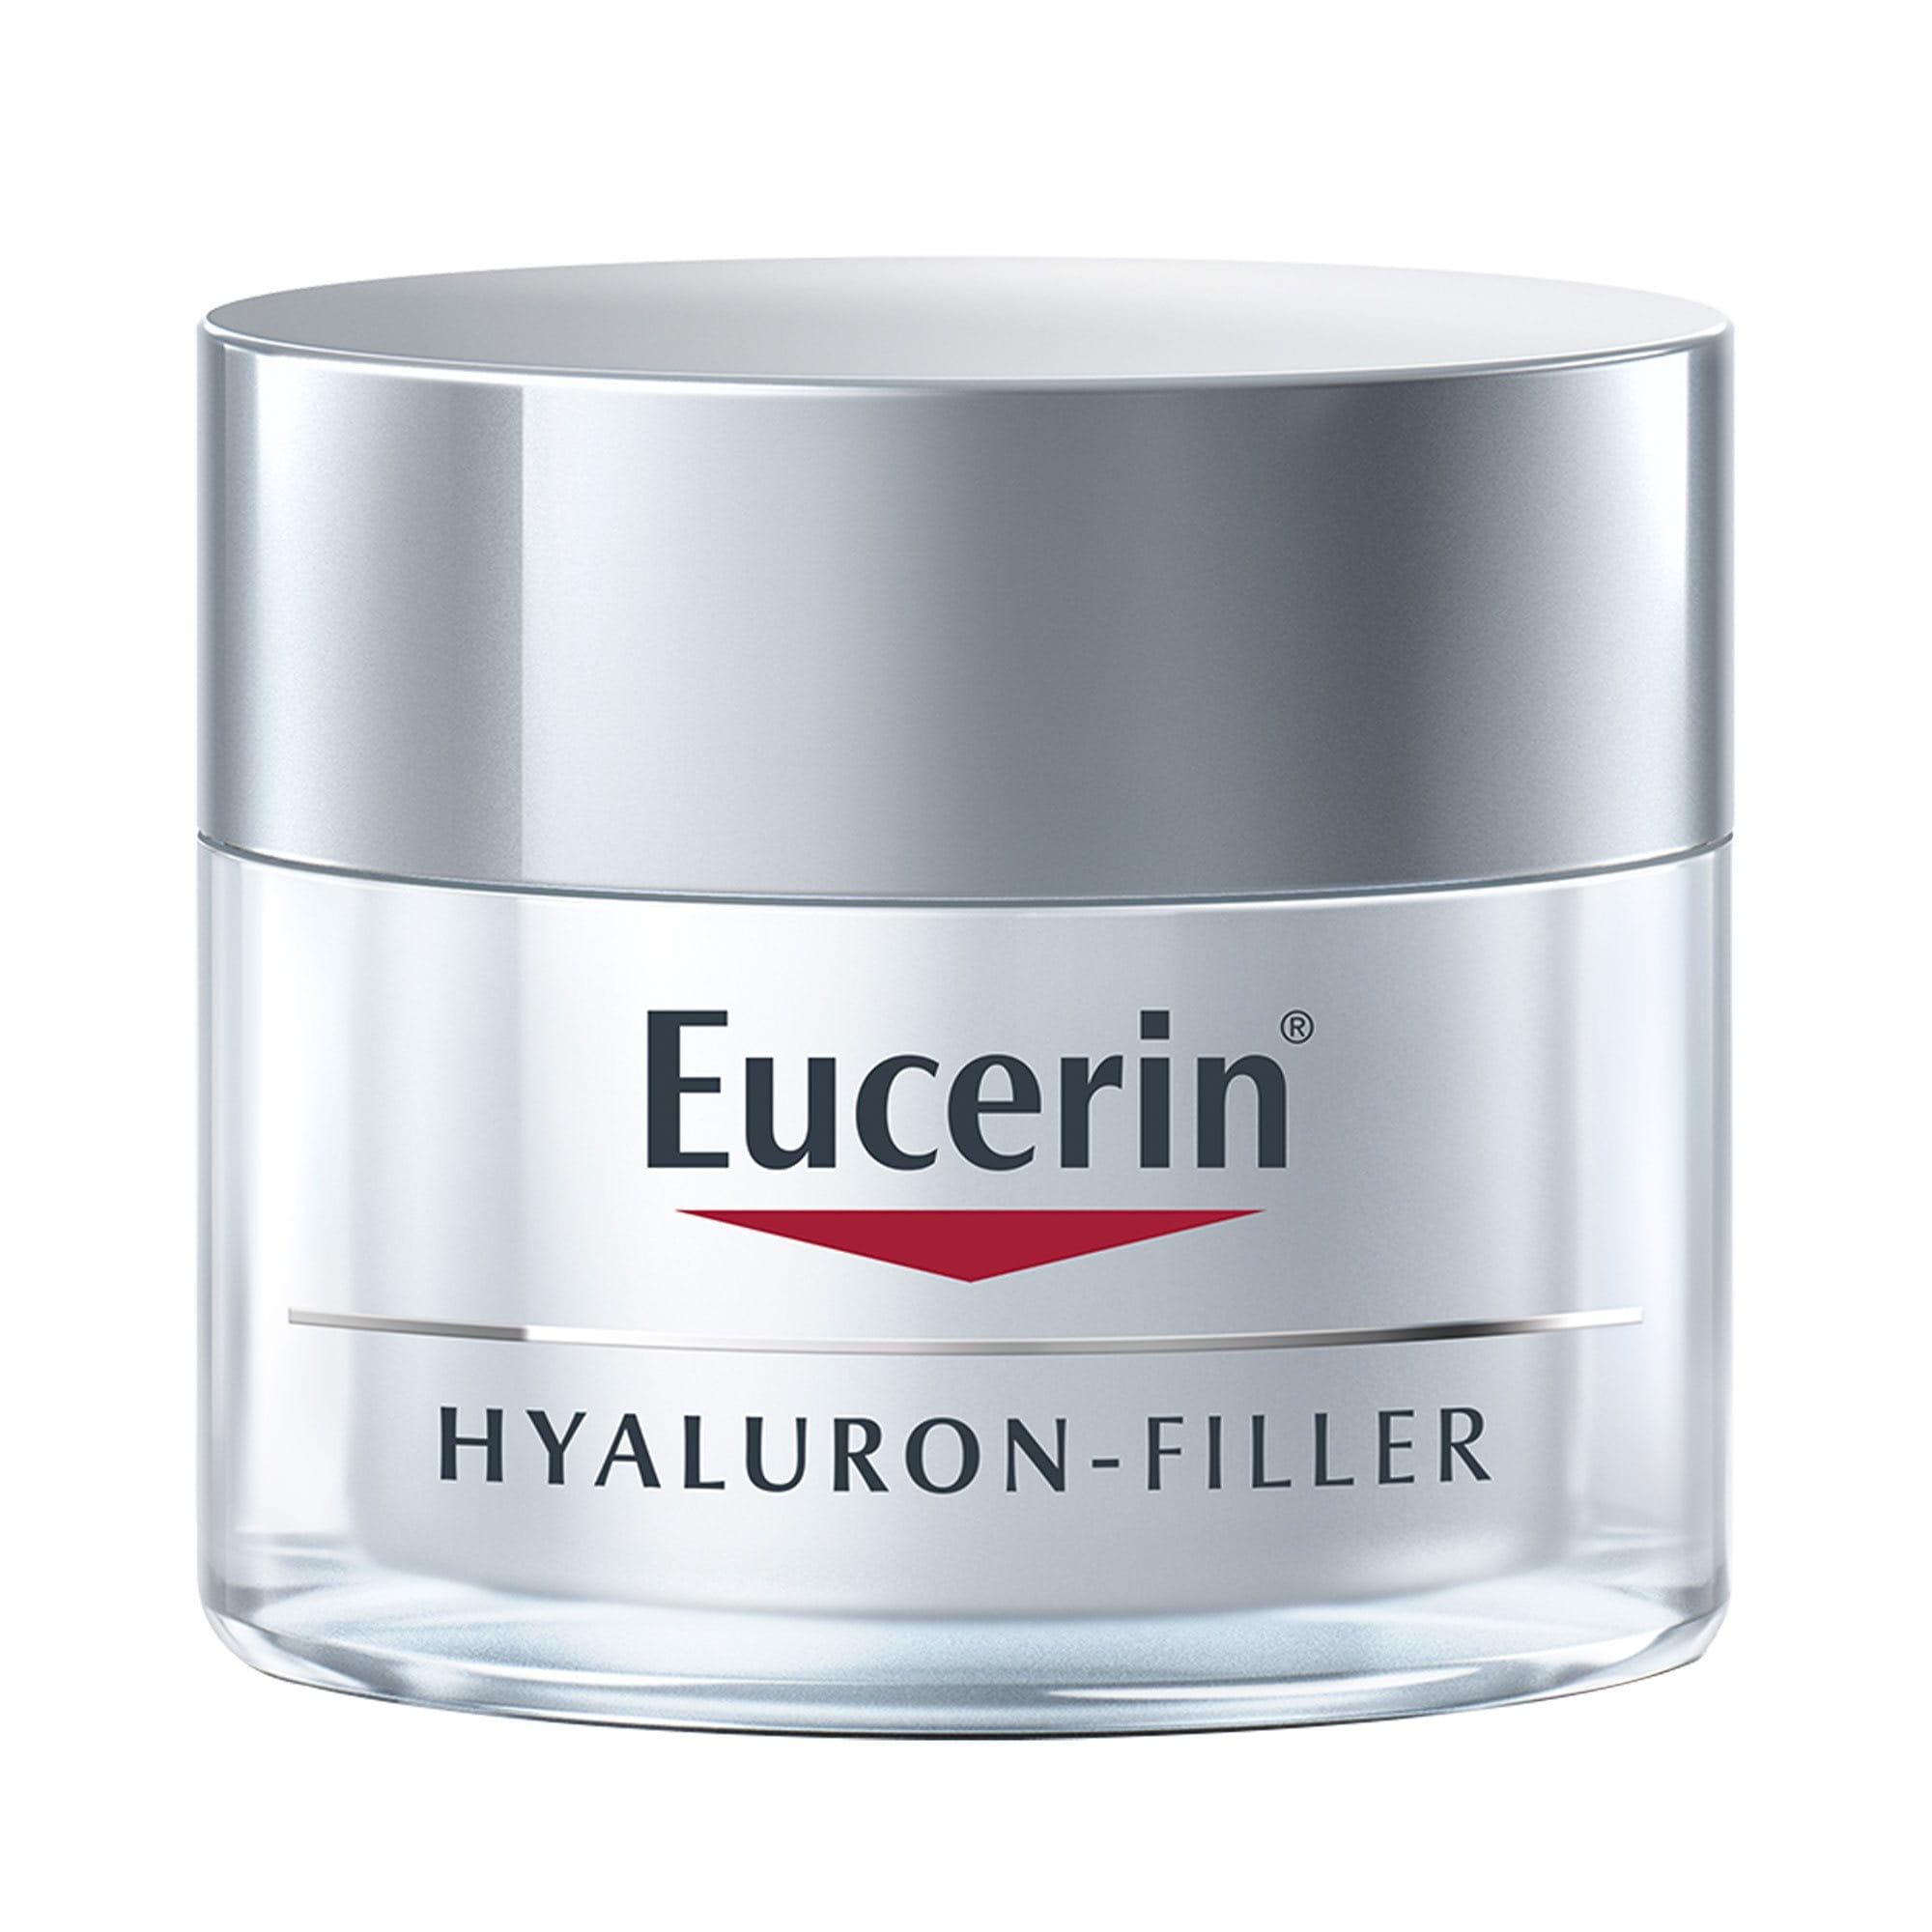 63485_Eucerin-HYALURON-FILLER-Crema-Facial-Rellenadora-de-Arrugas-de-Da-para-piel-seca_packshot